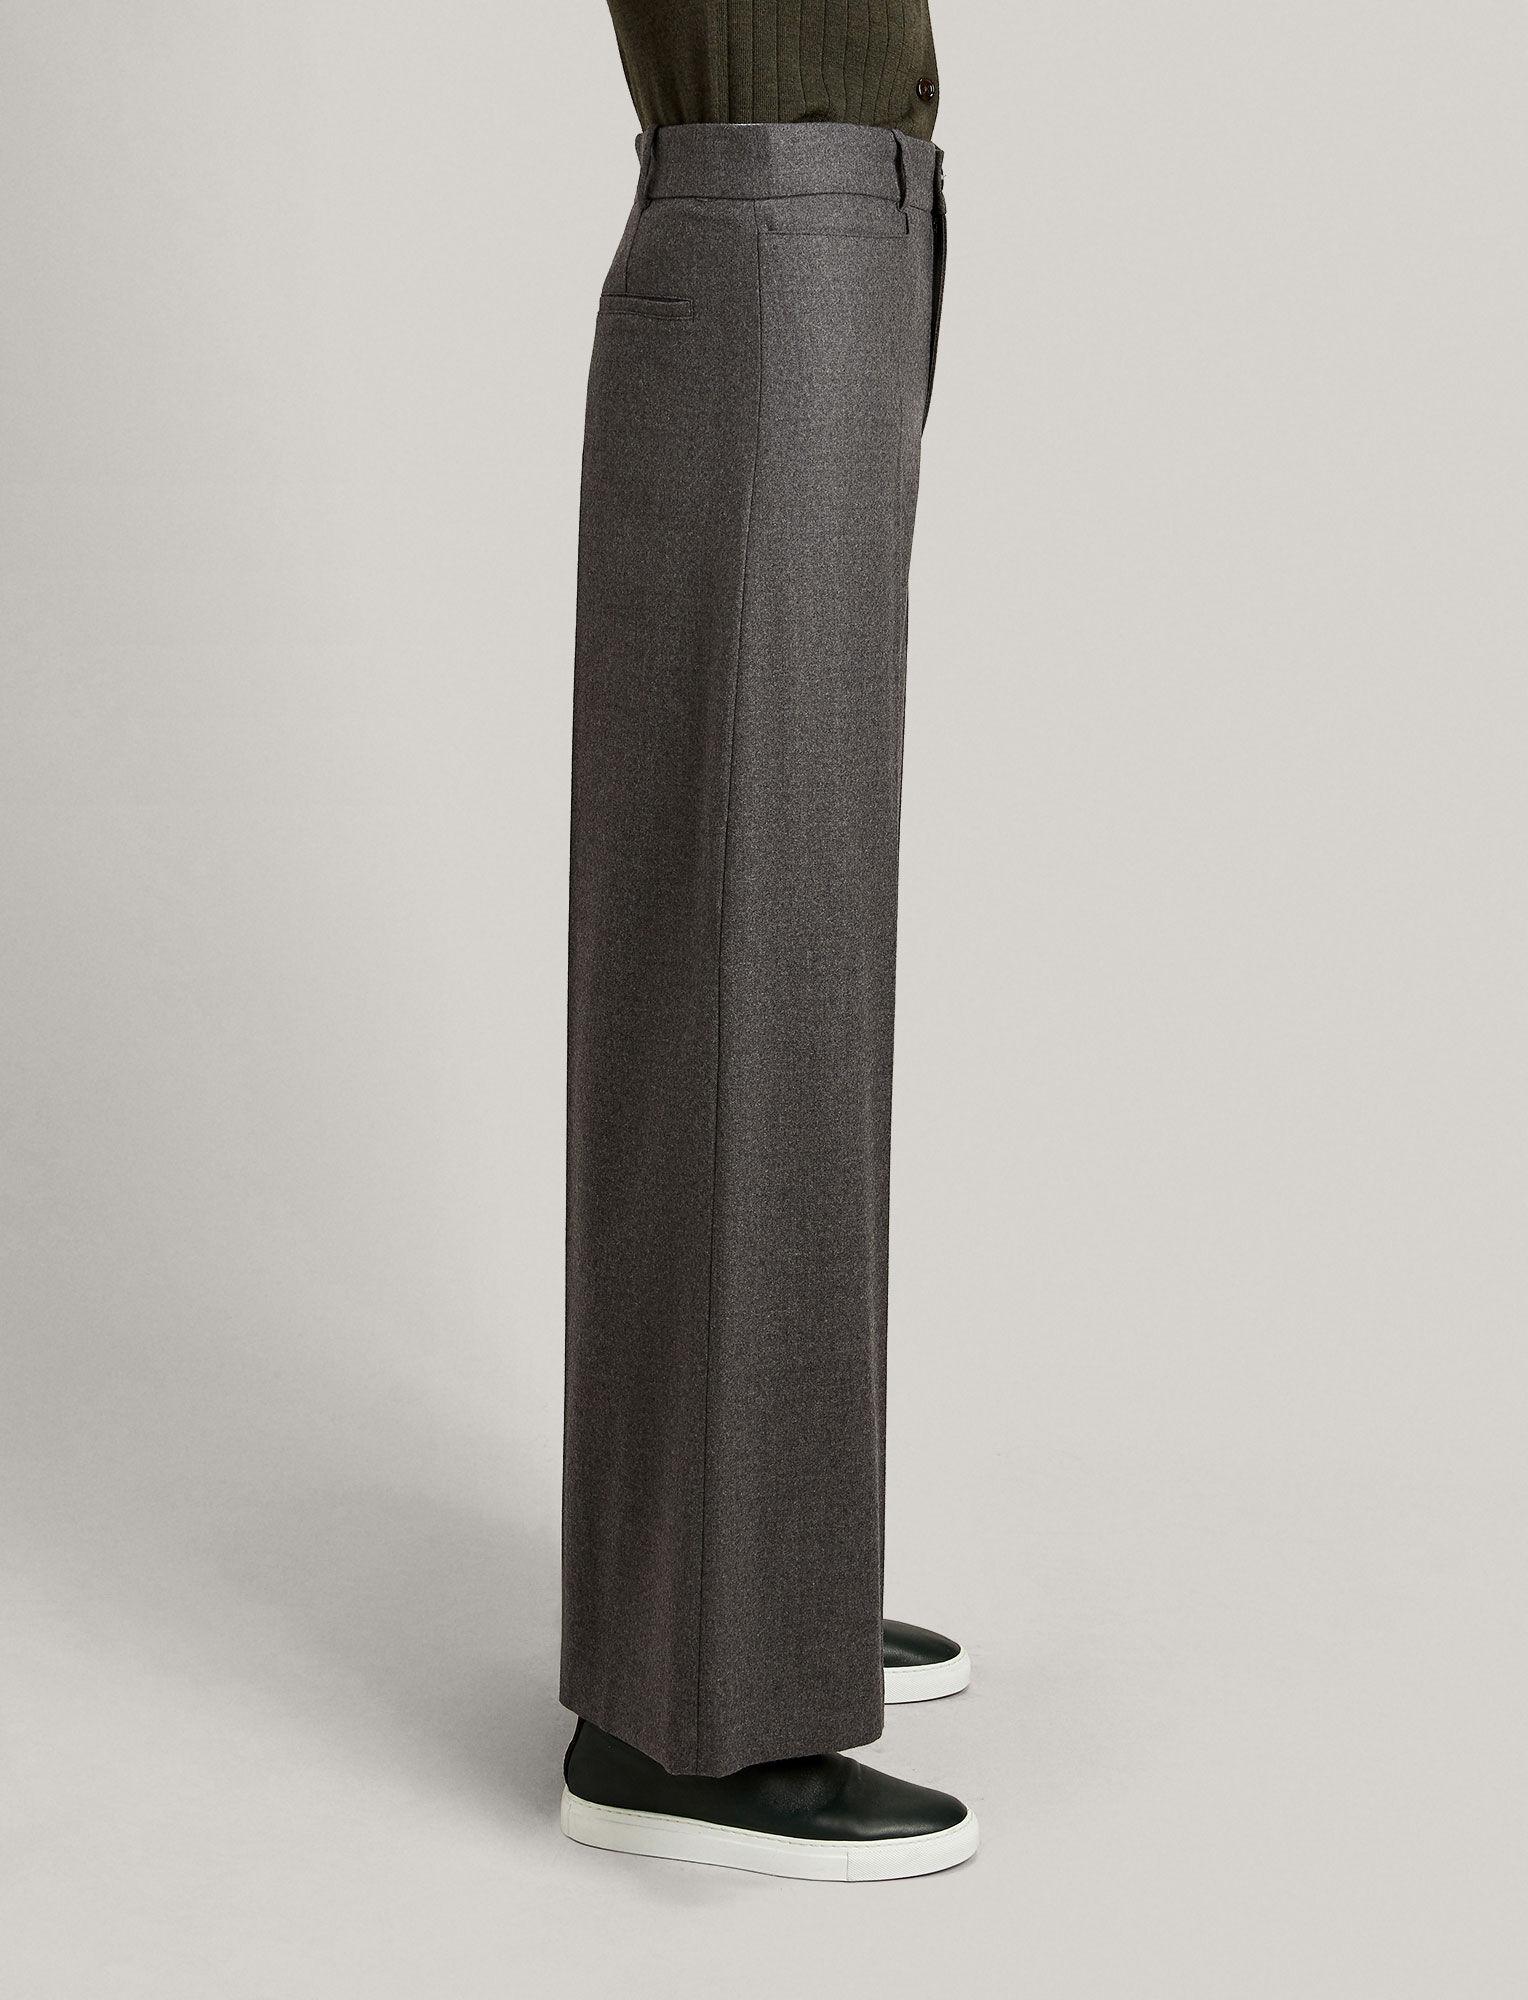 Joseph, Dana Flannel Stretch Trousers, in CHARCOAL